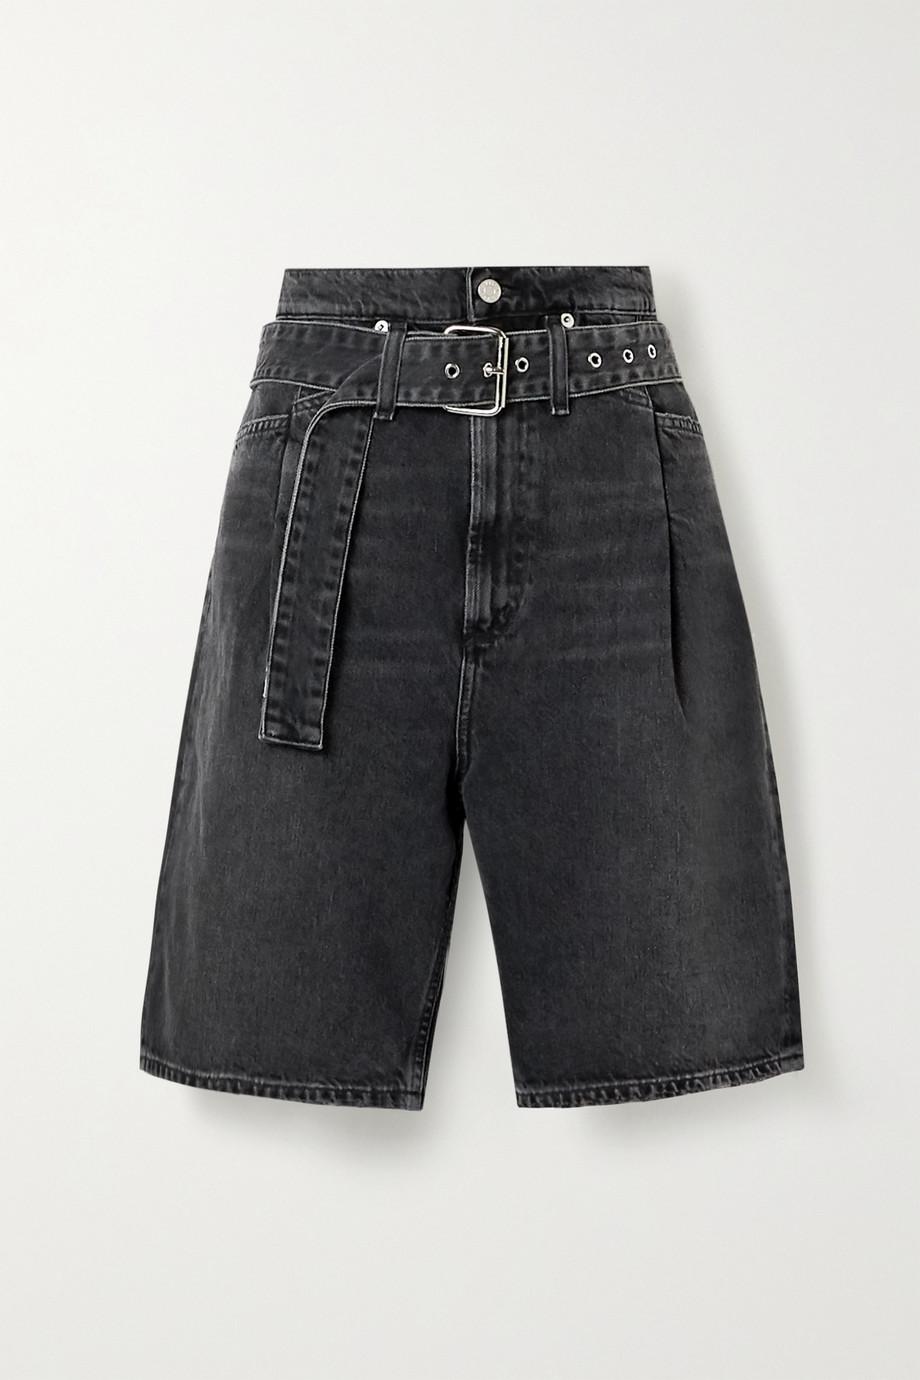 AGOLDE Reworked 90's belted denim shorts